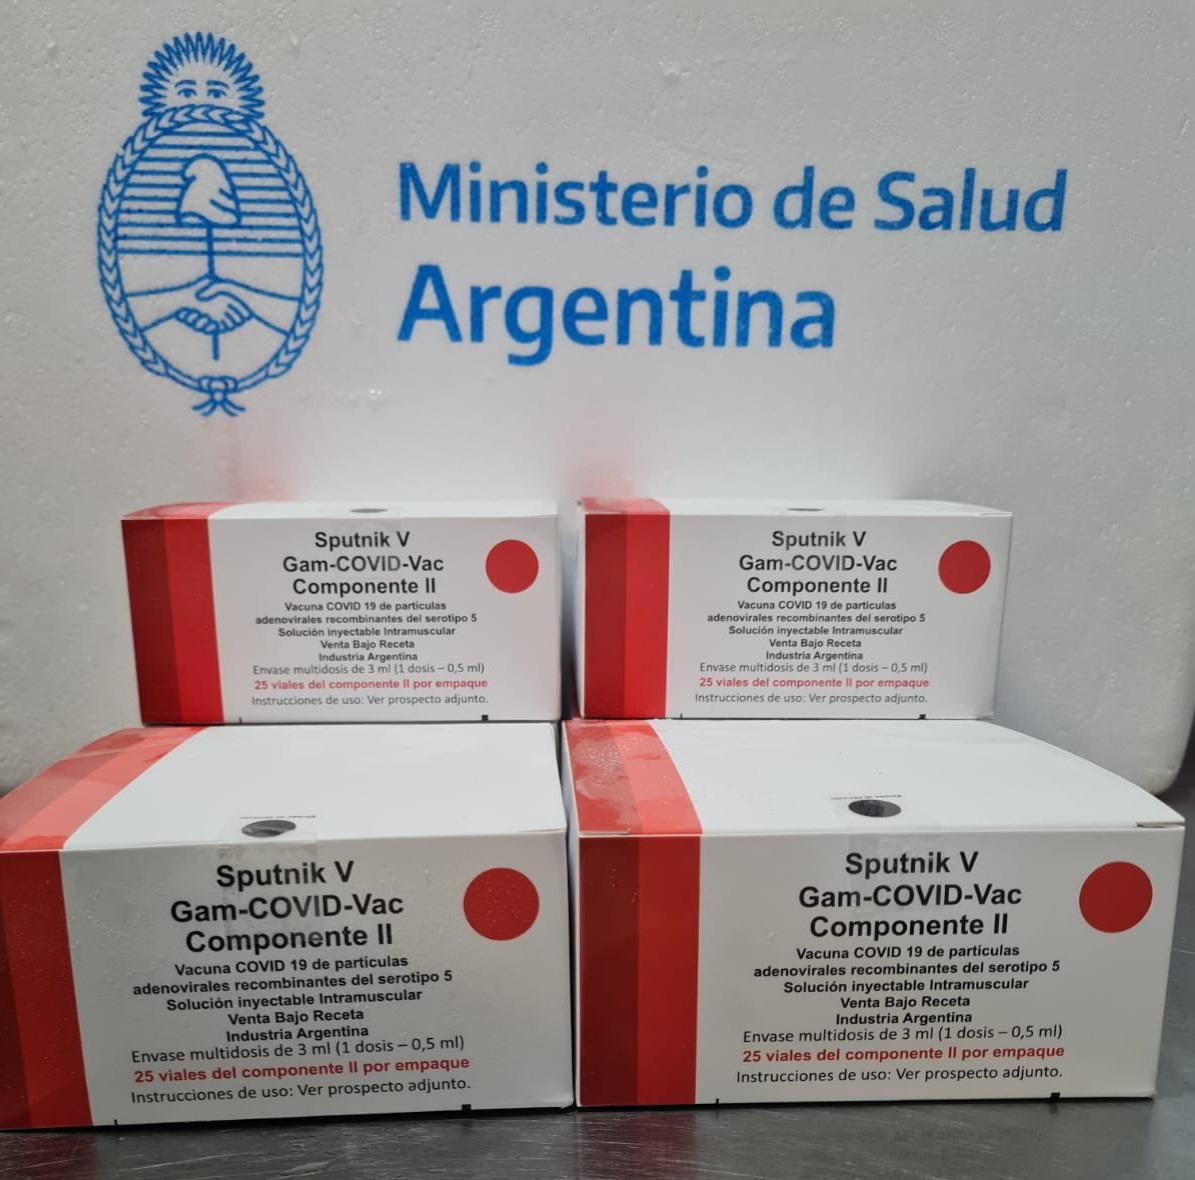 Arribó a Mar del Plata un lote de producción nacional del segundo componente de la vacuna Sputnik V